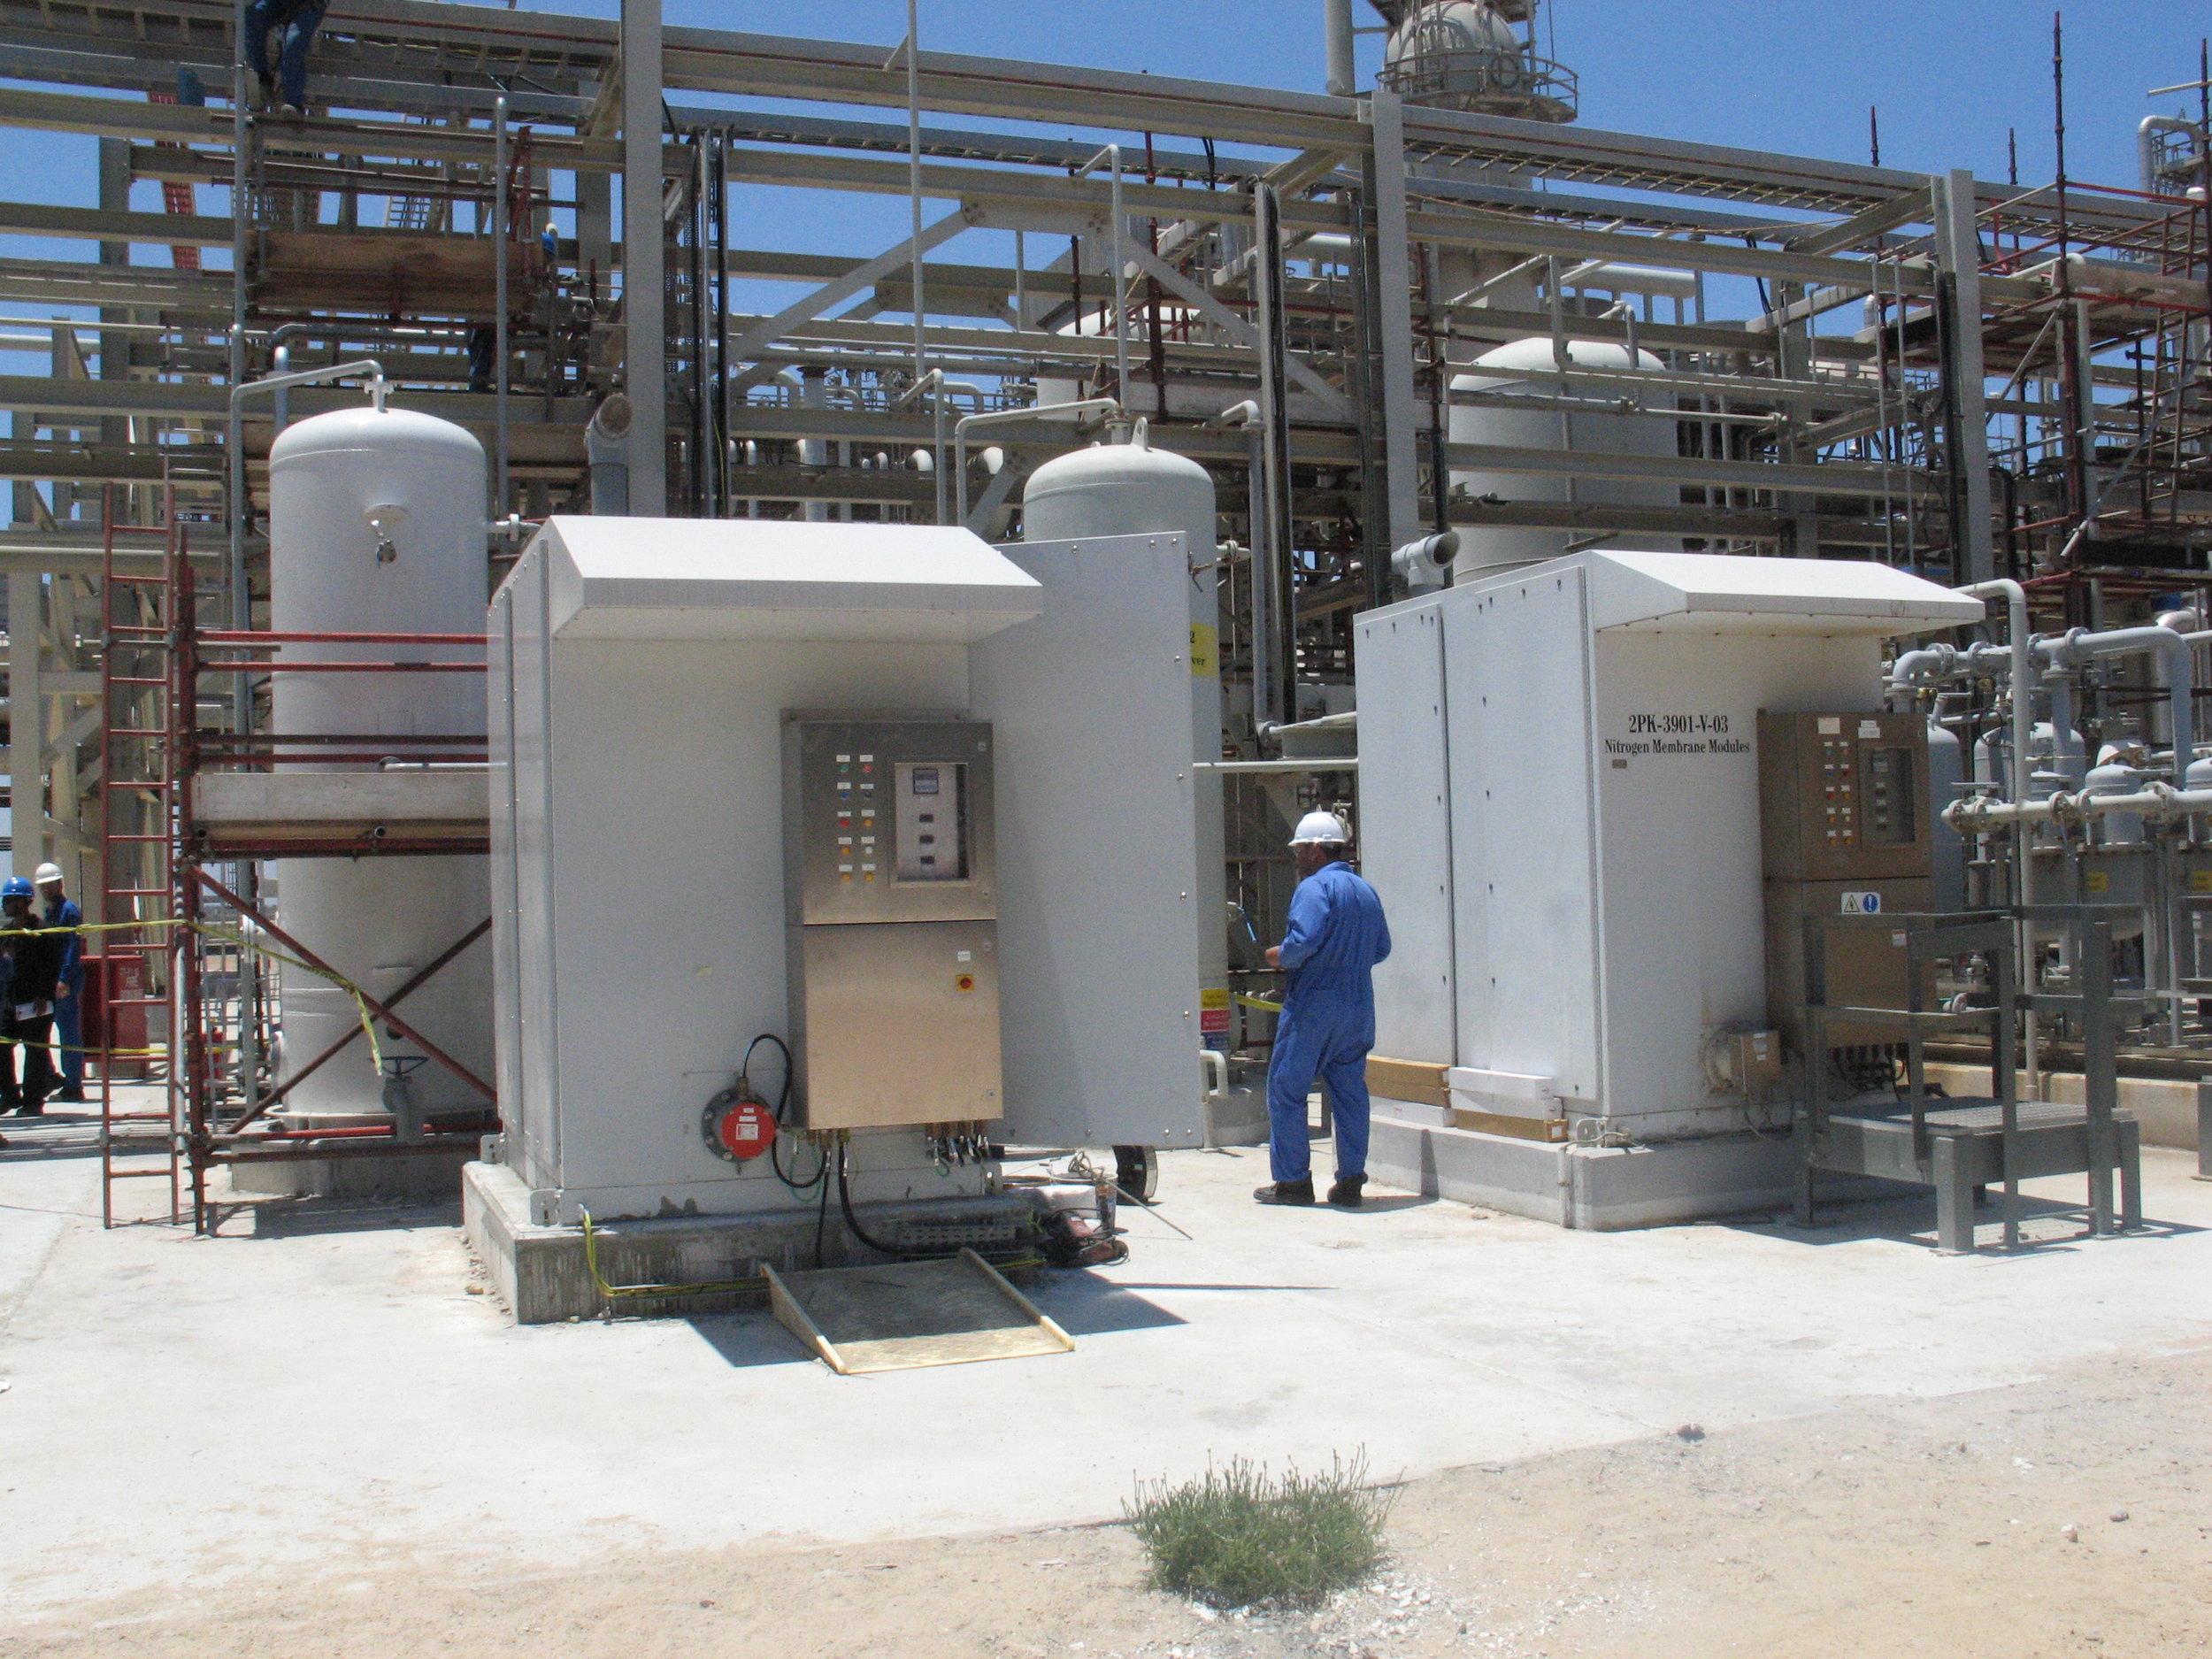 Early Gas Land Nitrogen Generation Systems